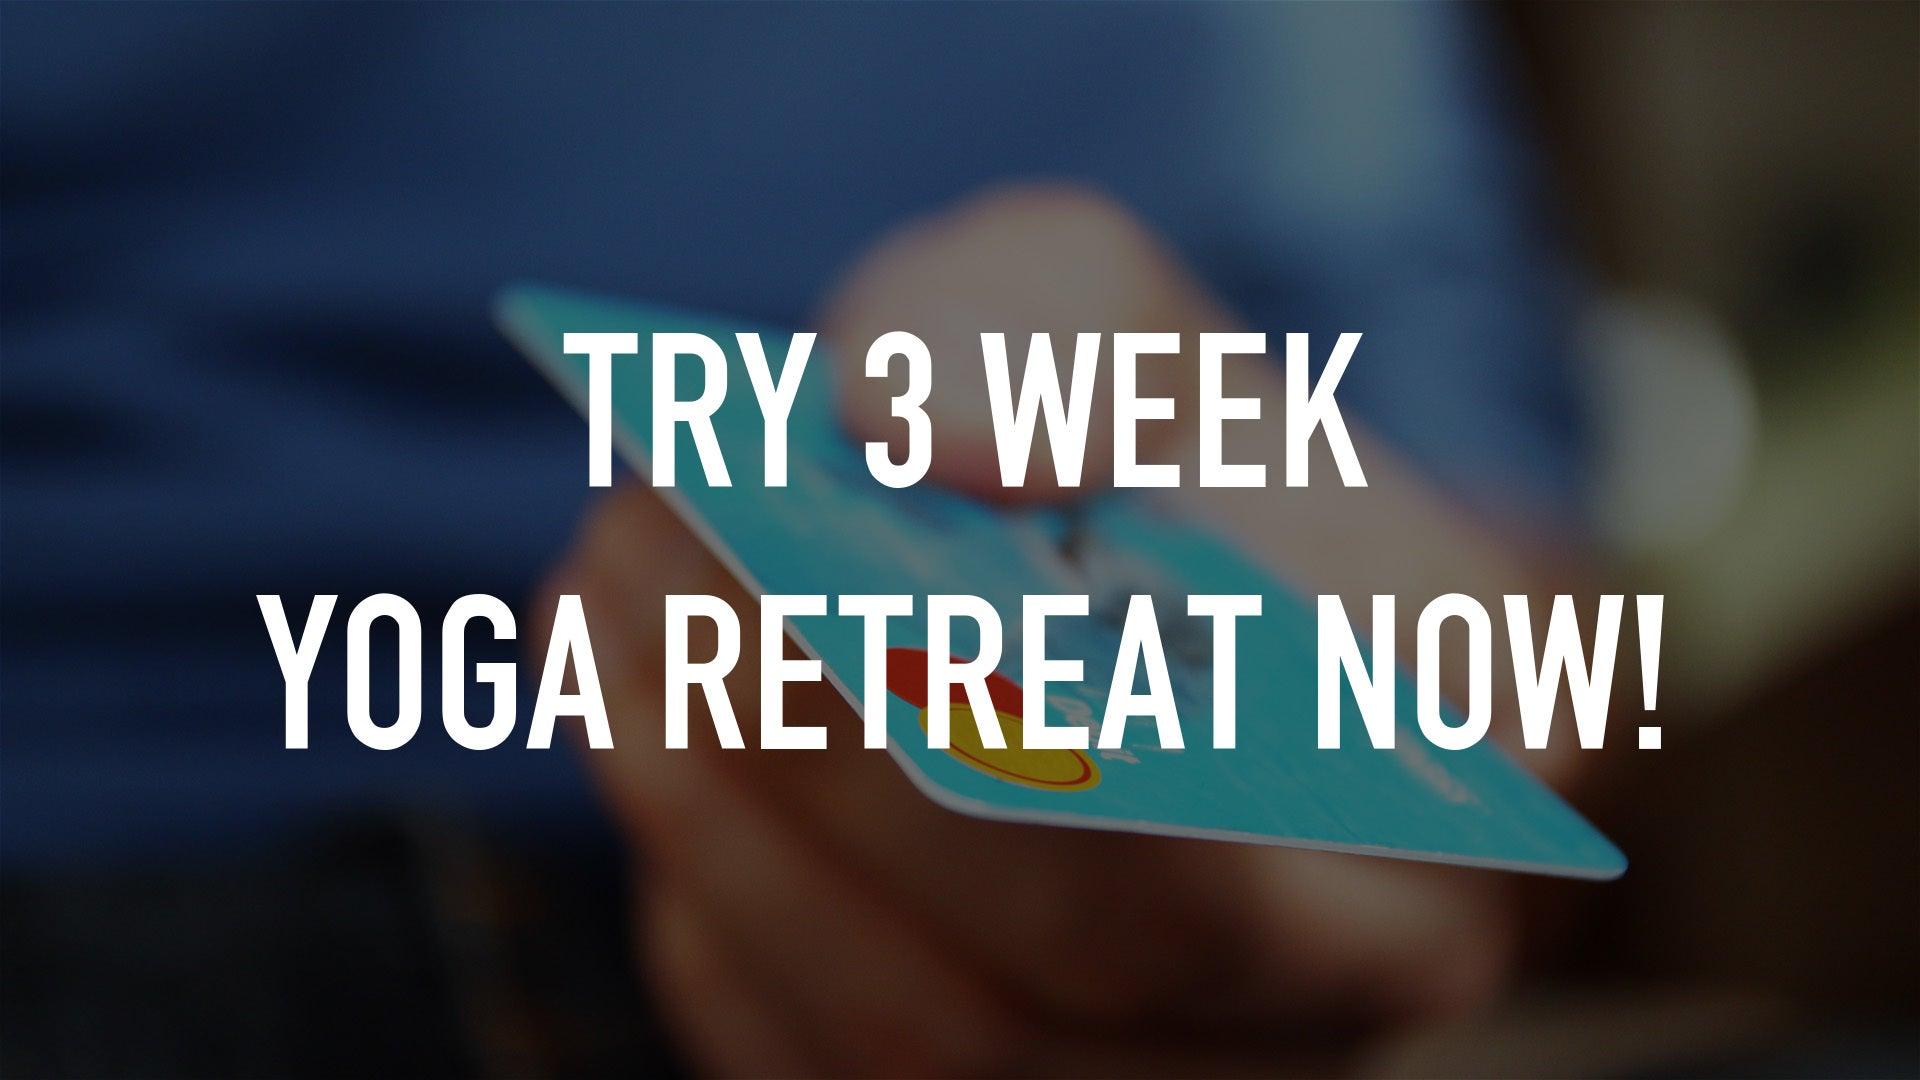 Try 3 Week Yoga Retreat Now!